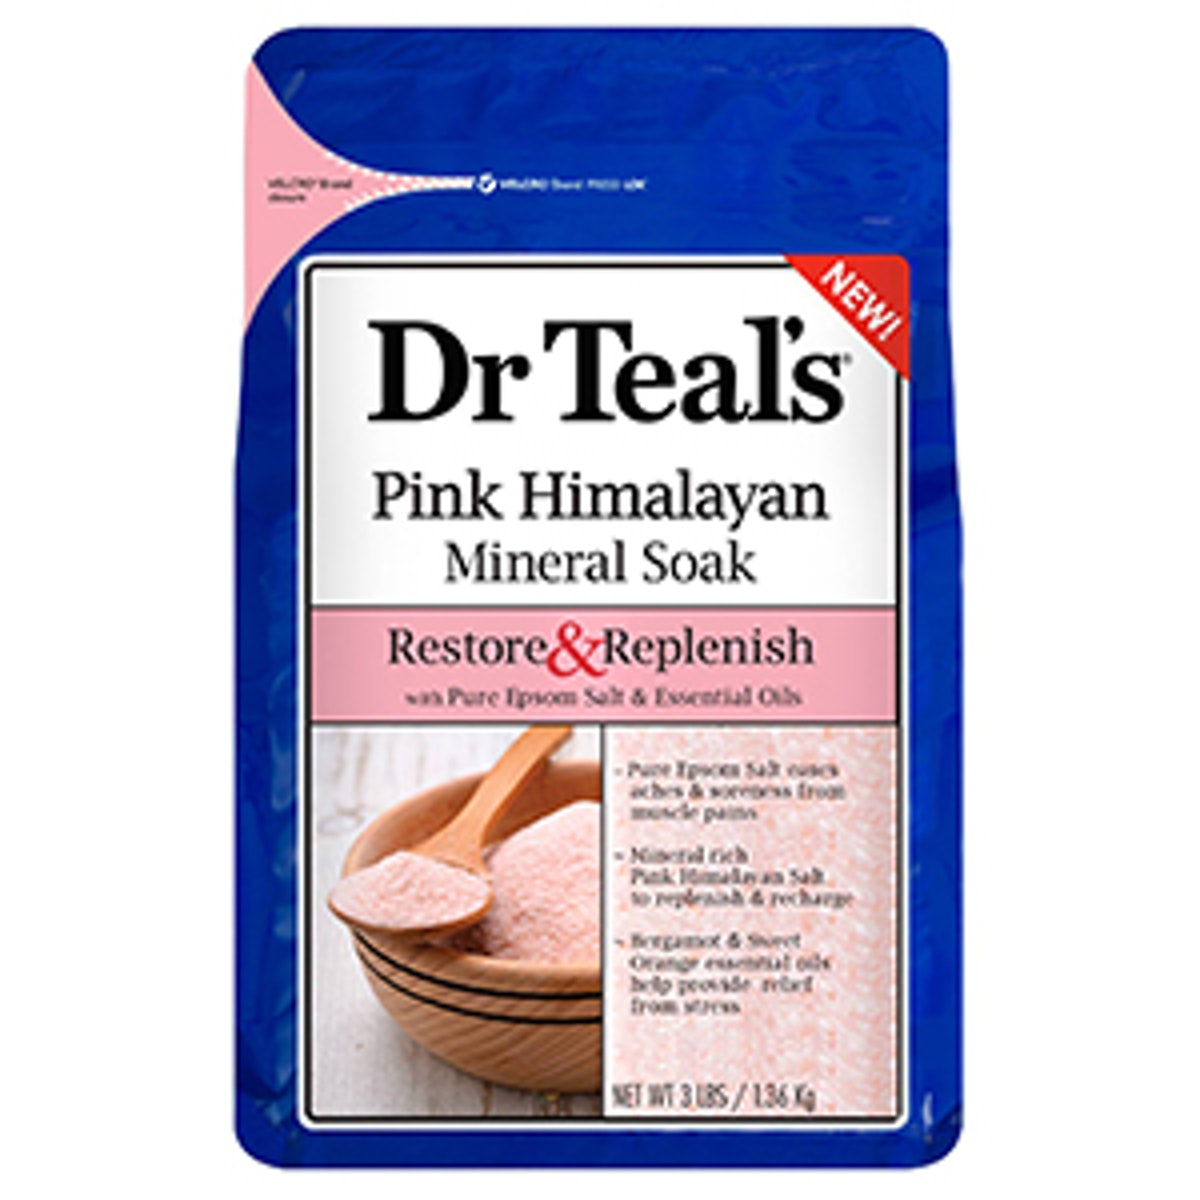 Dr. Teal's Restore & Replenish Pure Epsom Salt & Essential Oils Pink Himalayan Mineral Soak